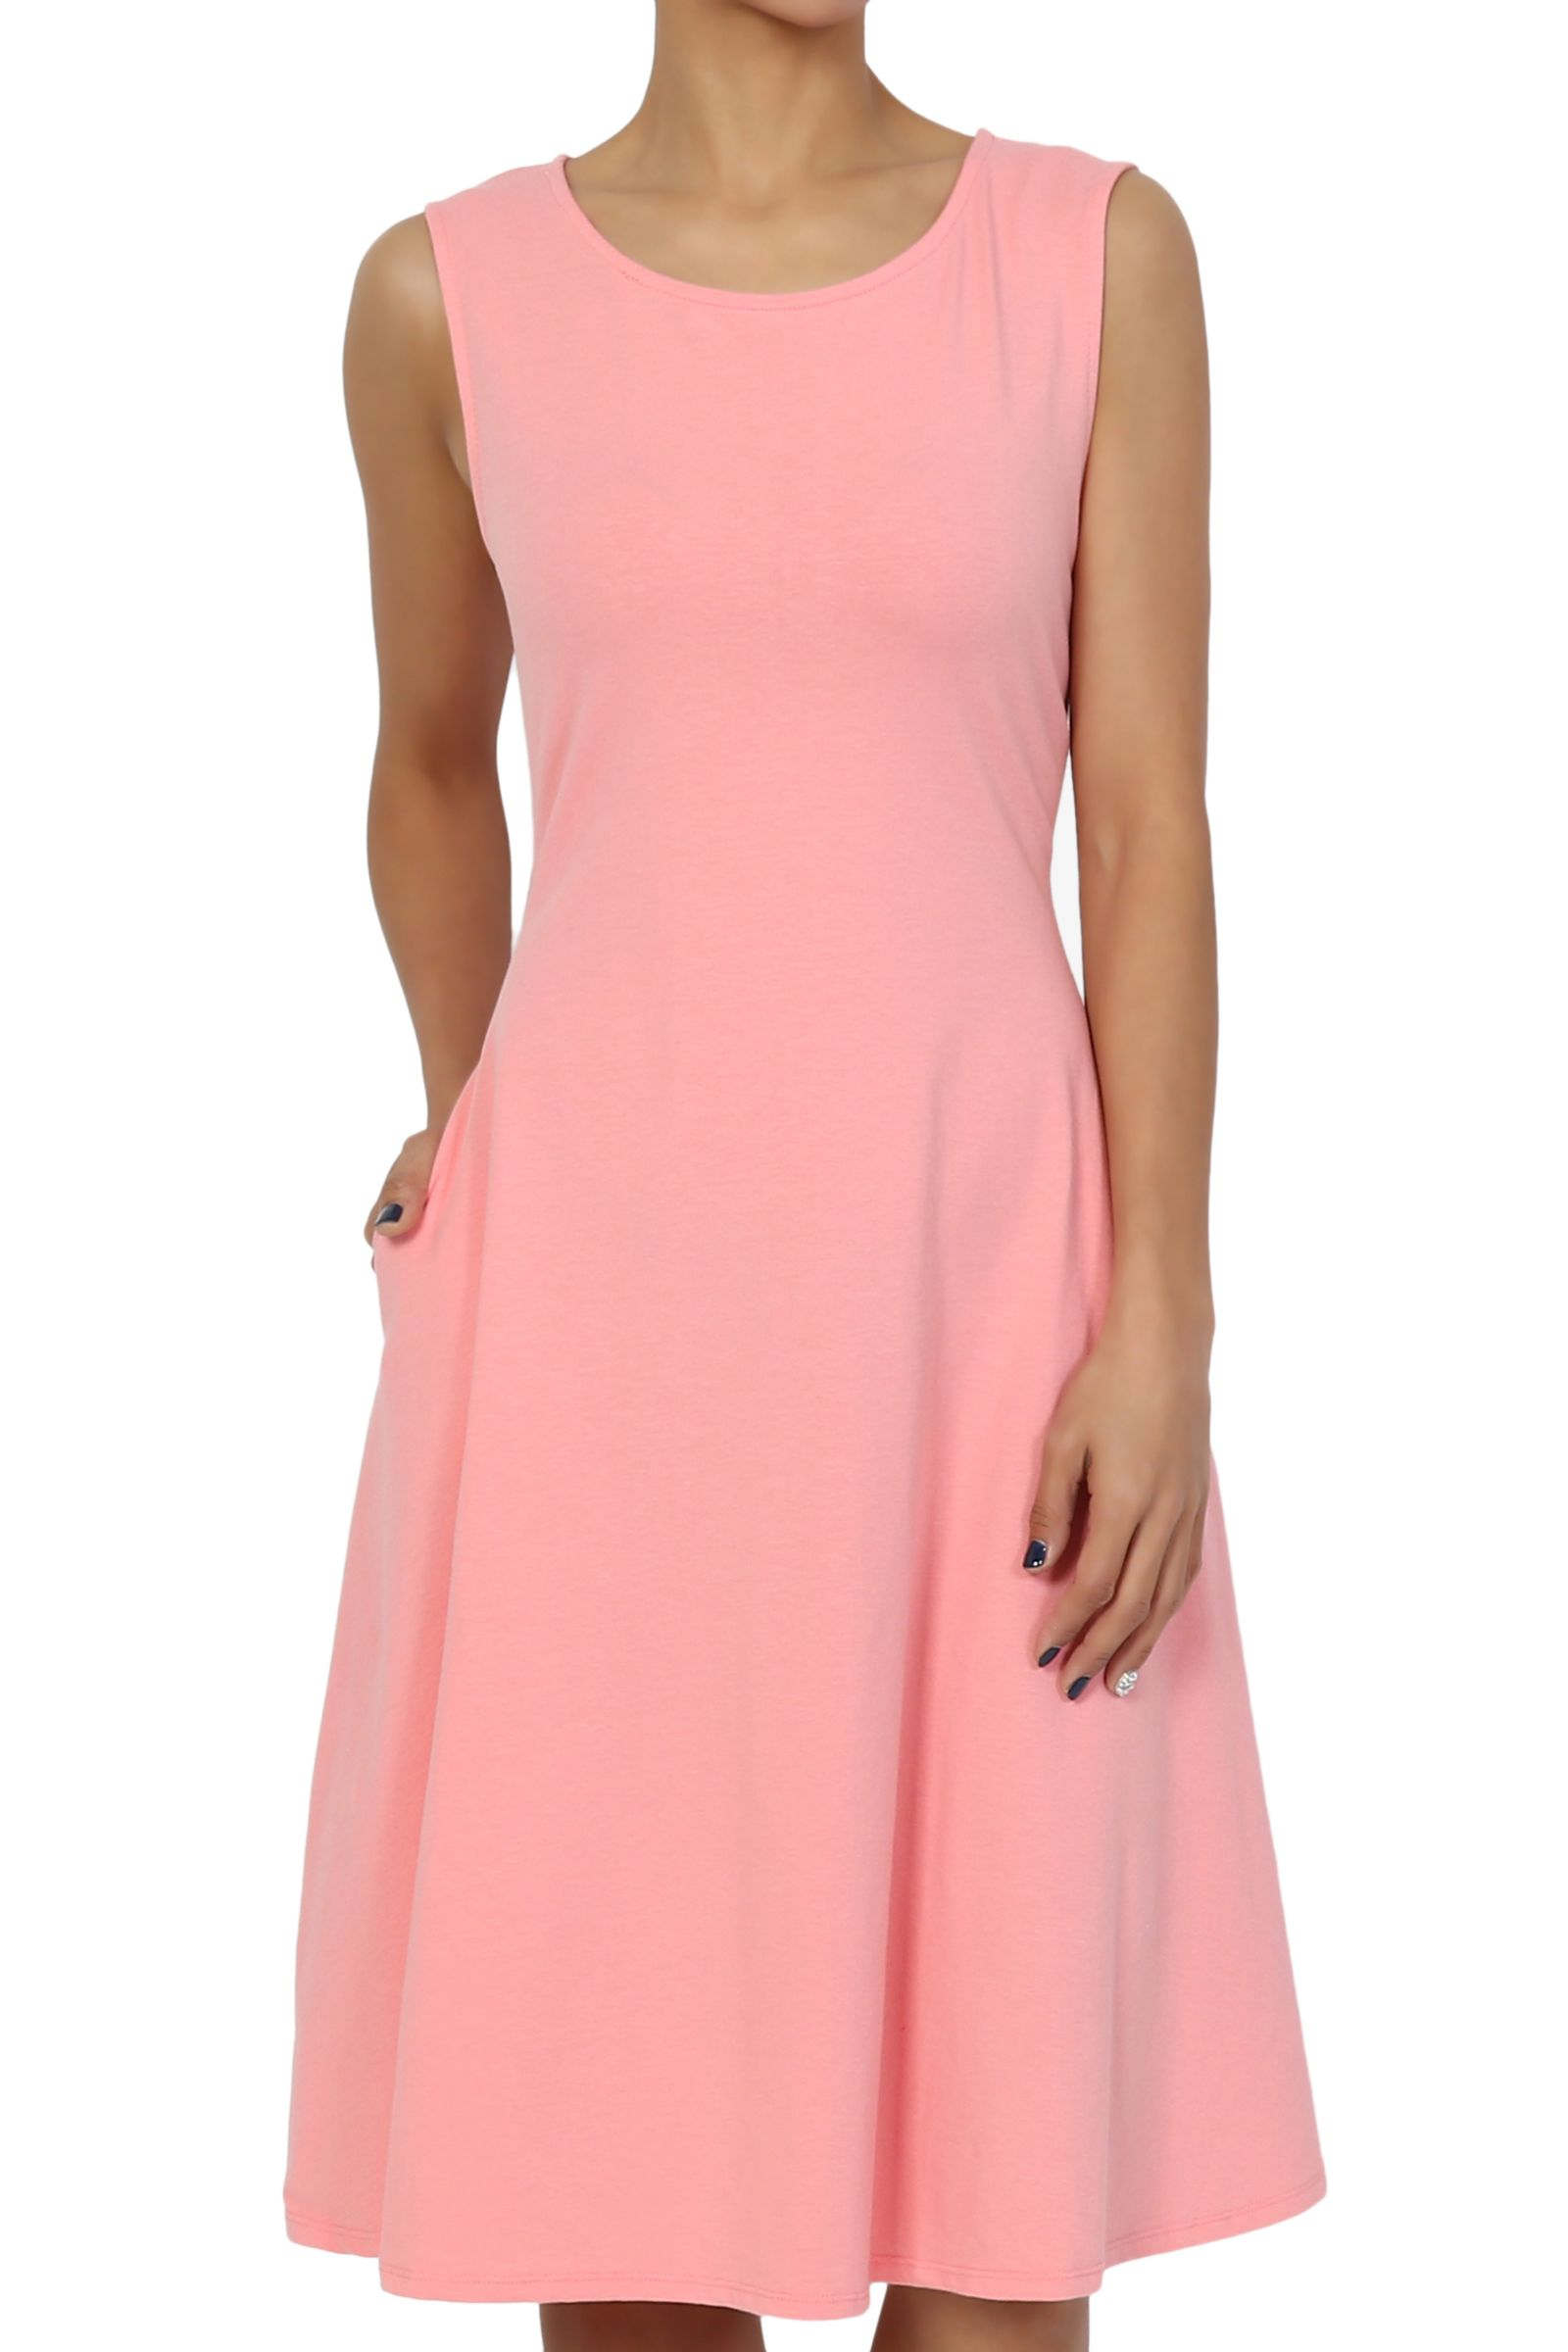 Themogan Themogan Women S S 3x Sleeveless Stretch Cotton Jersey Fit And Flare Dress W Pocket Walmart Com In 2021 Flare Dress Dresses Day To Night Dresses [ 2400 x 1600 Pixel ]